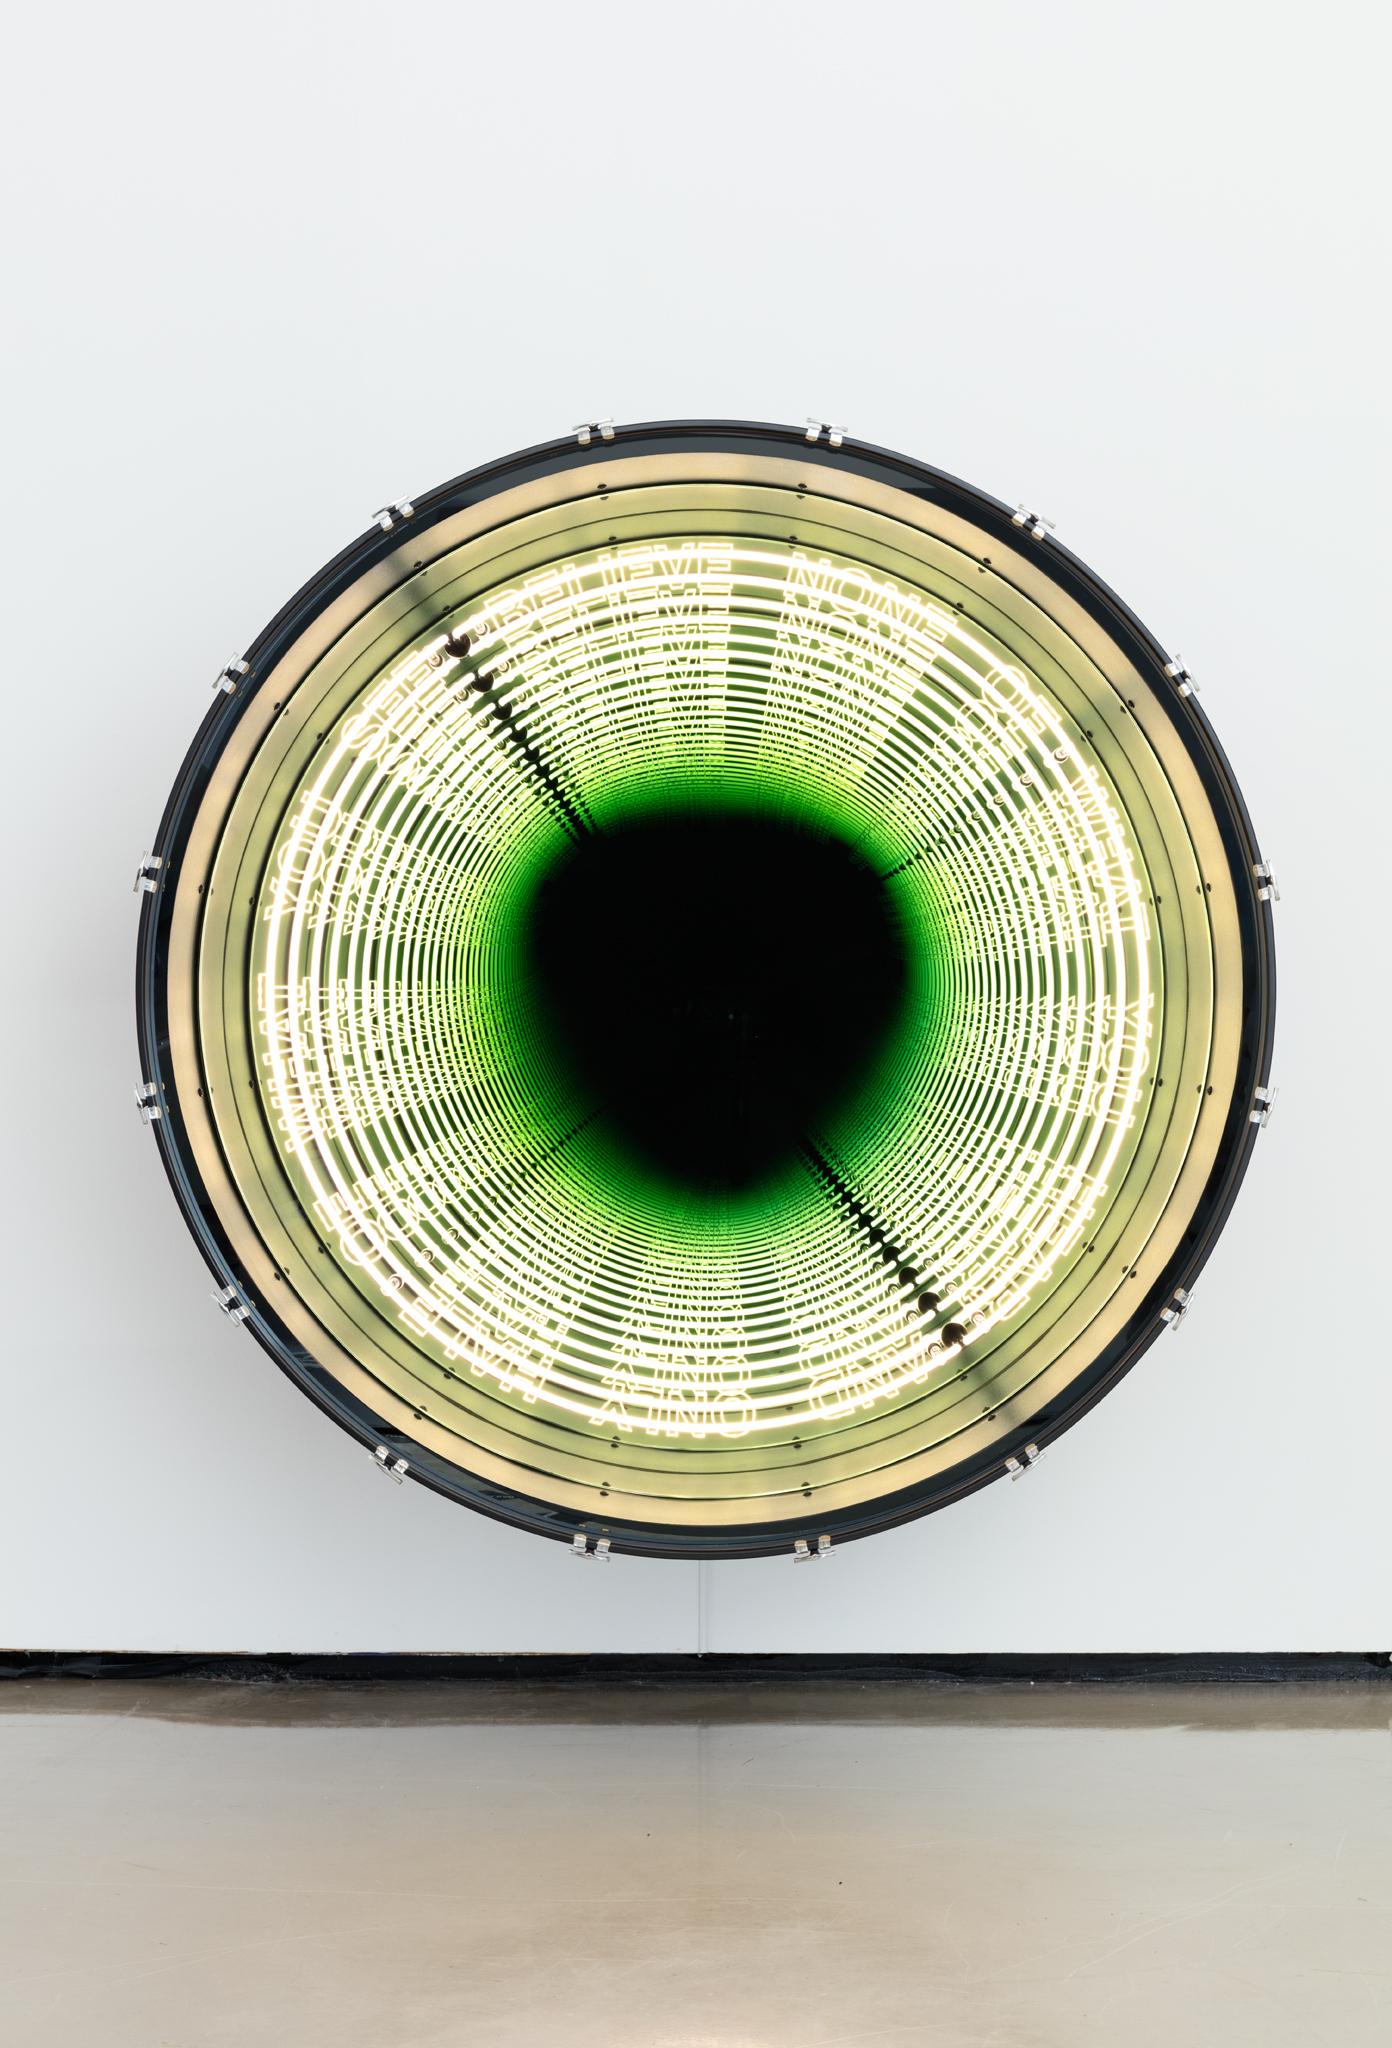 Iván Navarro, Benjamin Franklin, 2016 Paul Kasmin Gallery  neon, LED lights, aluminum, drum, mirror, one-way mirror, and electric energy 152.4 × 152.4 × 71.8 Size (cm)